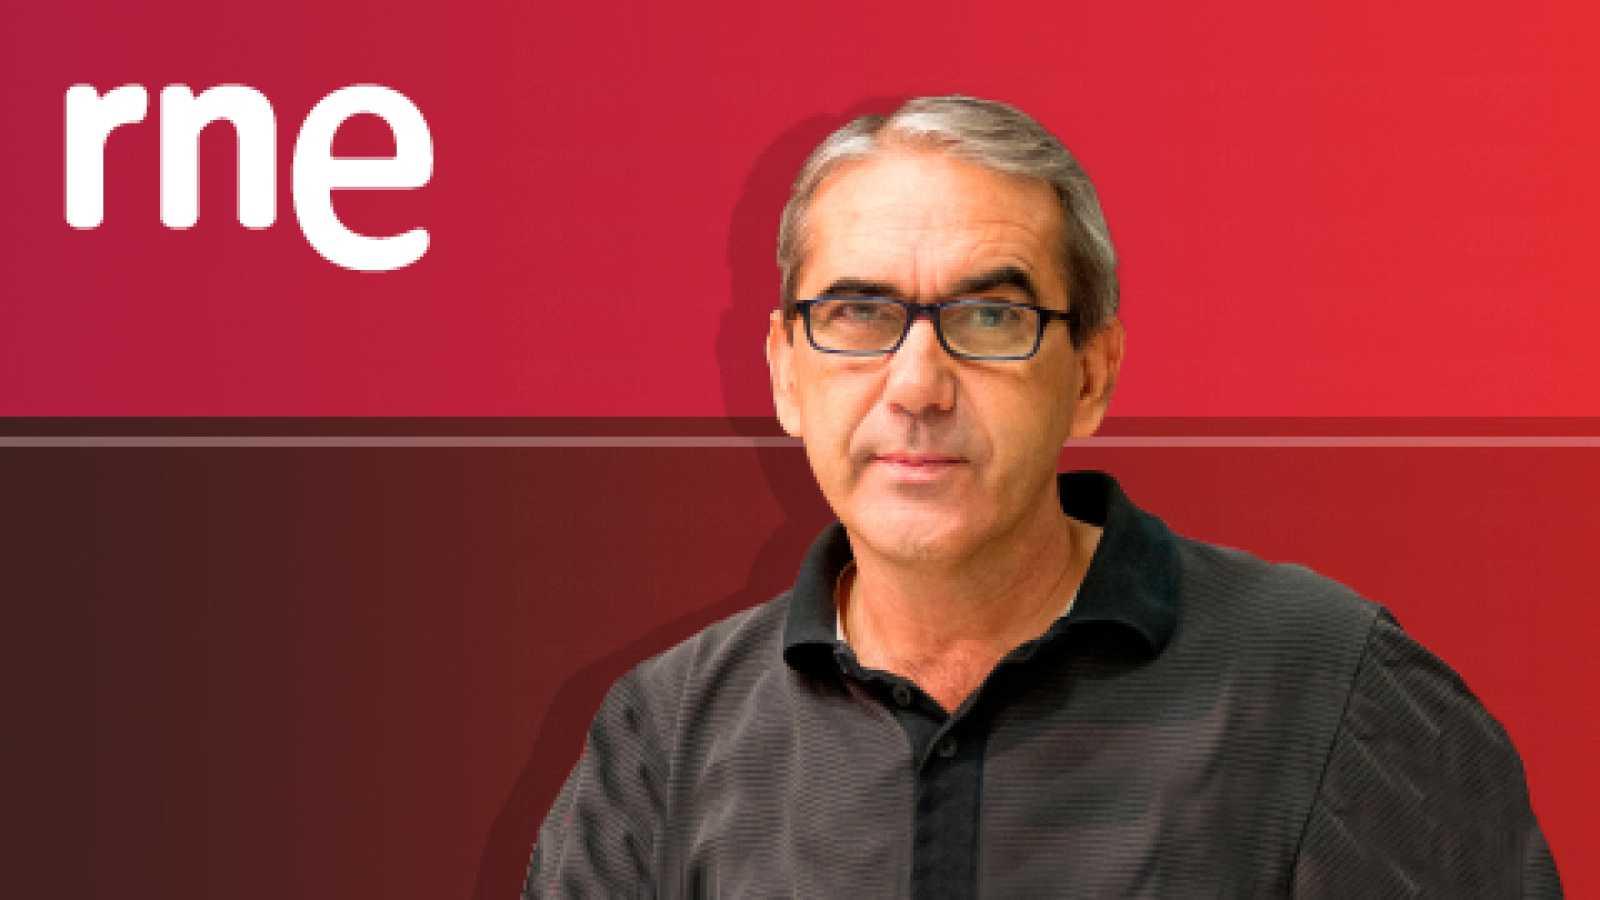 Historias de papel 15/11/20 - Javier Moro, Fernando Repiso, Isabel San Sebastián